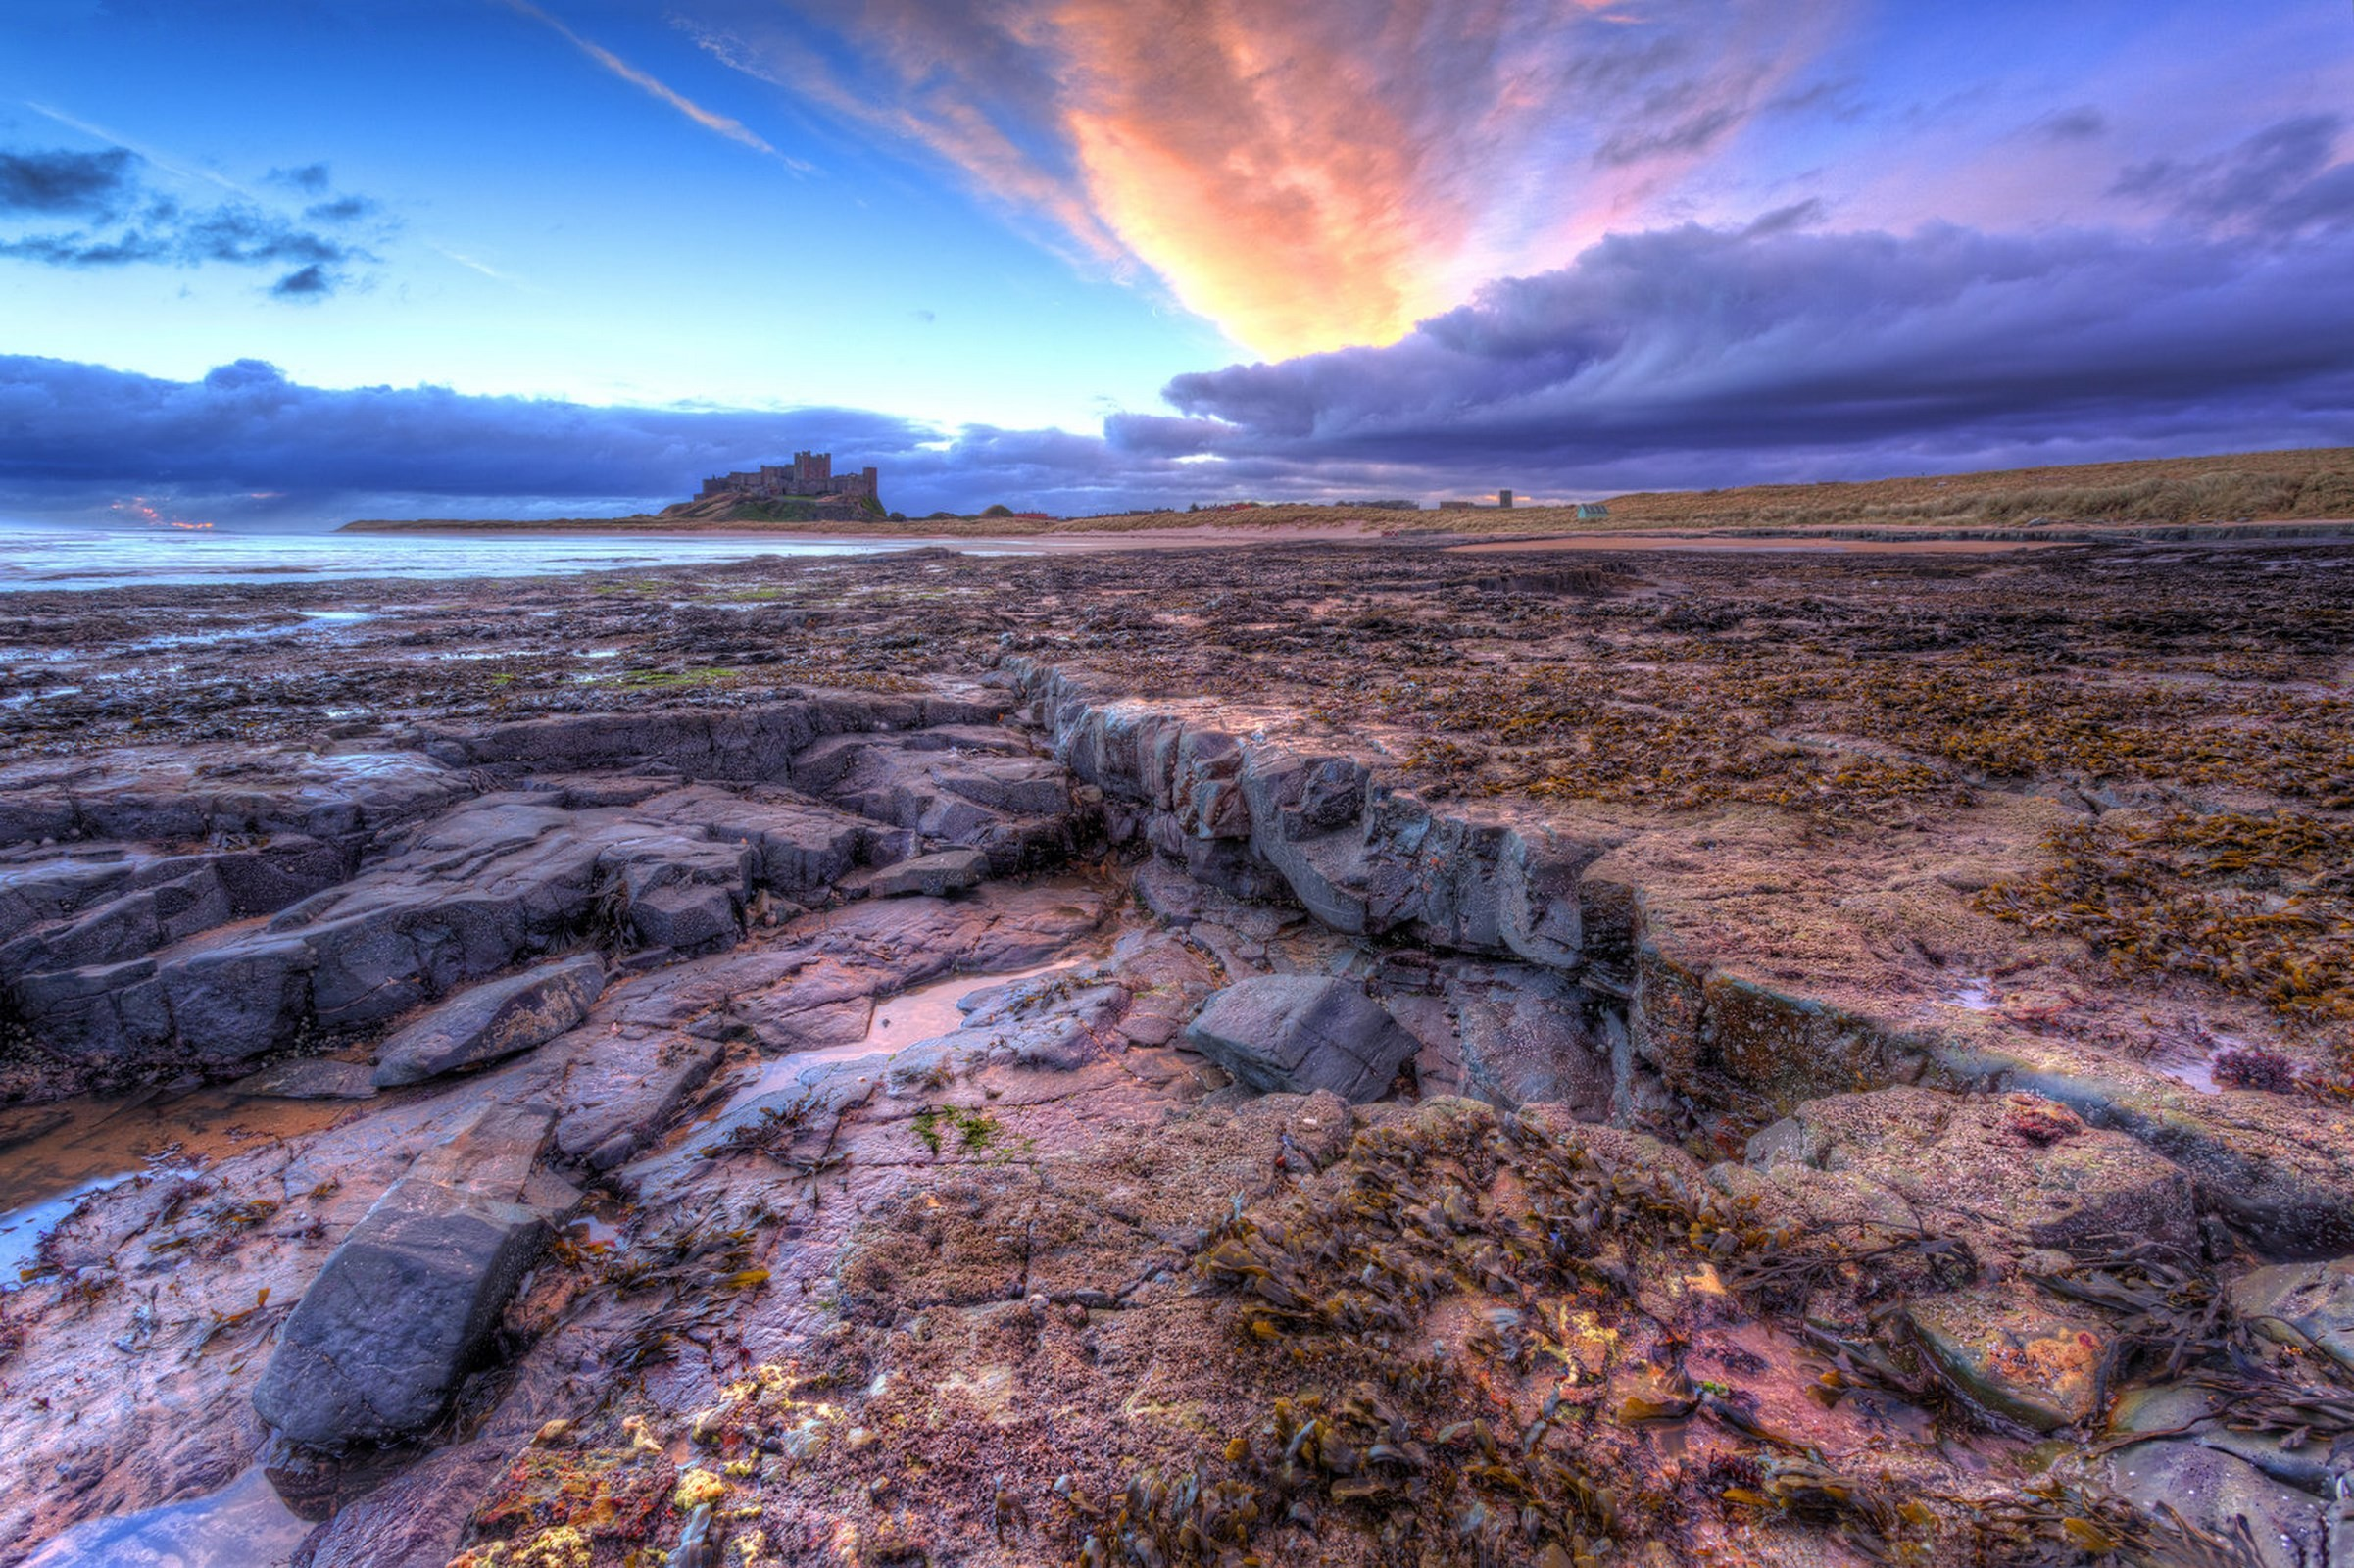 The Rock Hd Wallpapers 1080p Free Photo Rocky Landscape Grunge Grungy Landscape